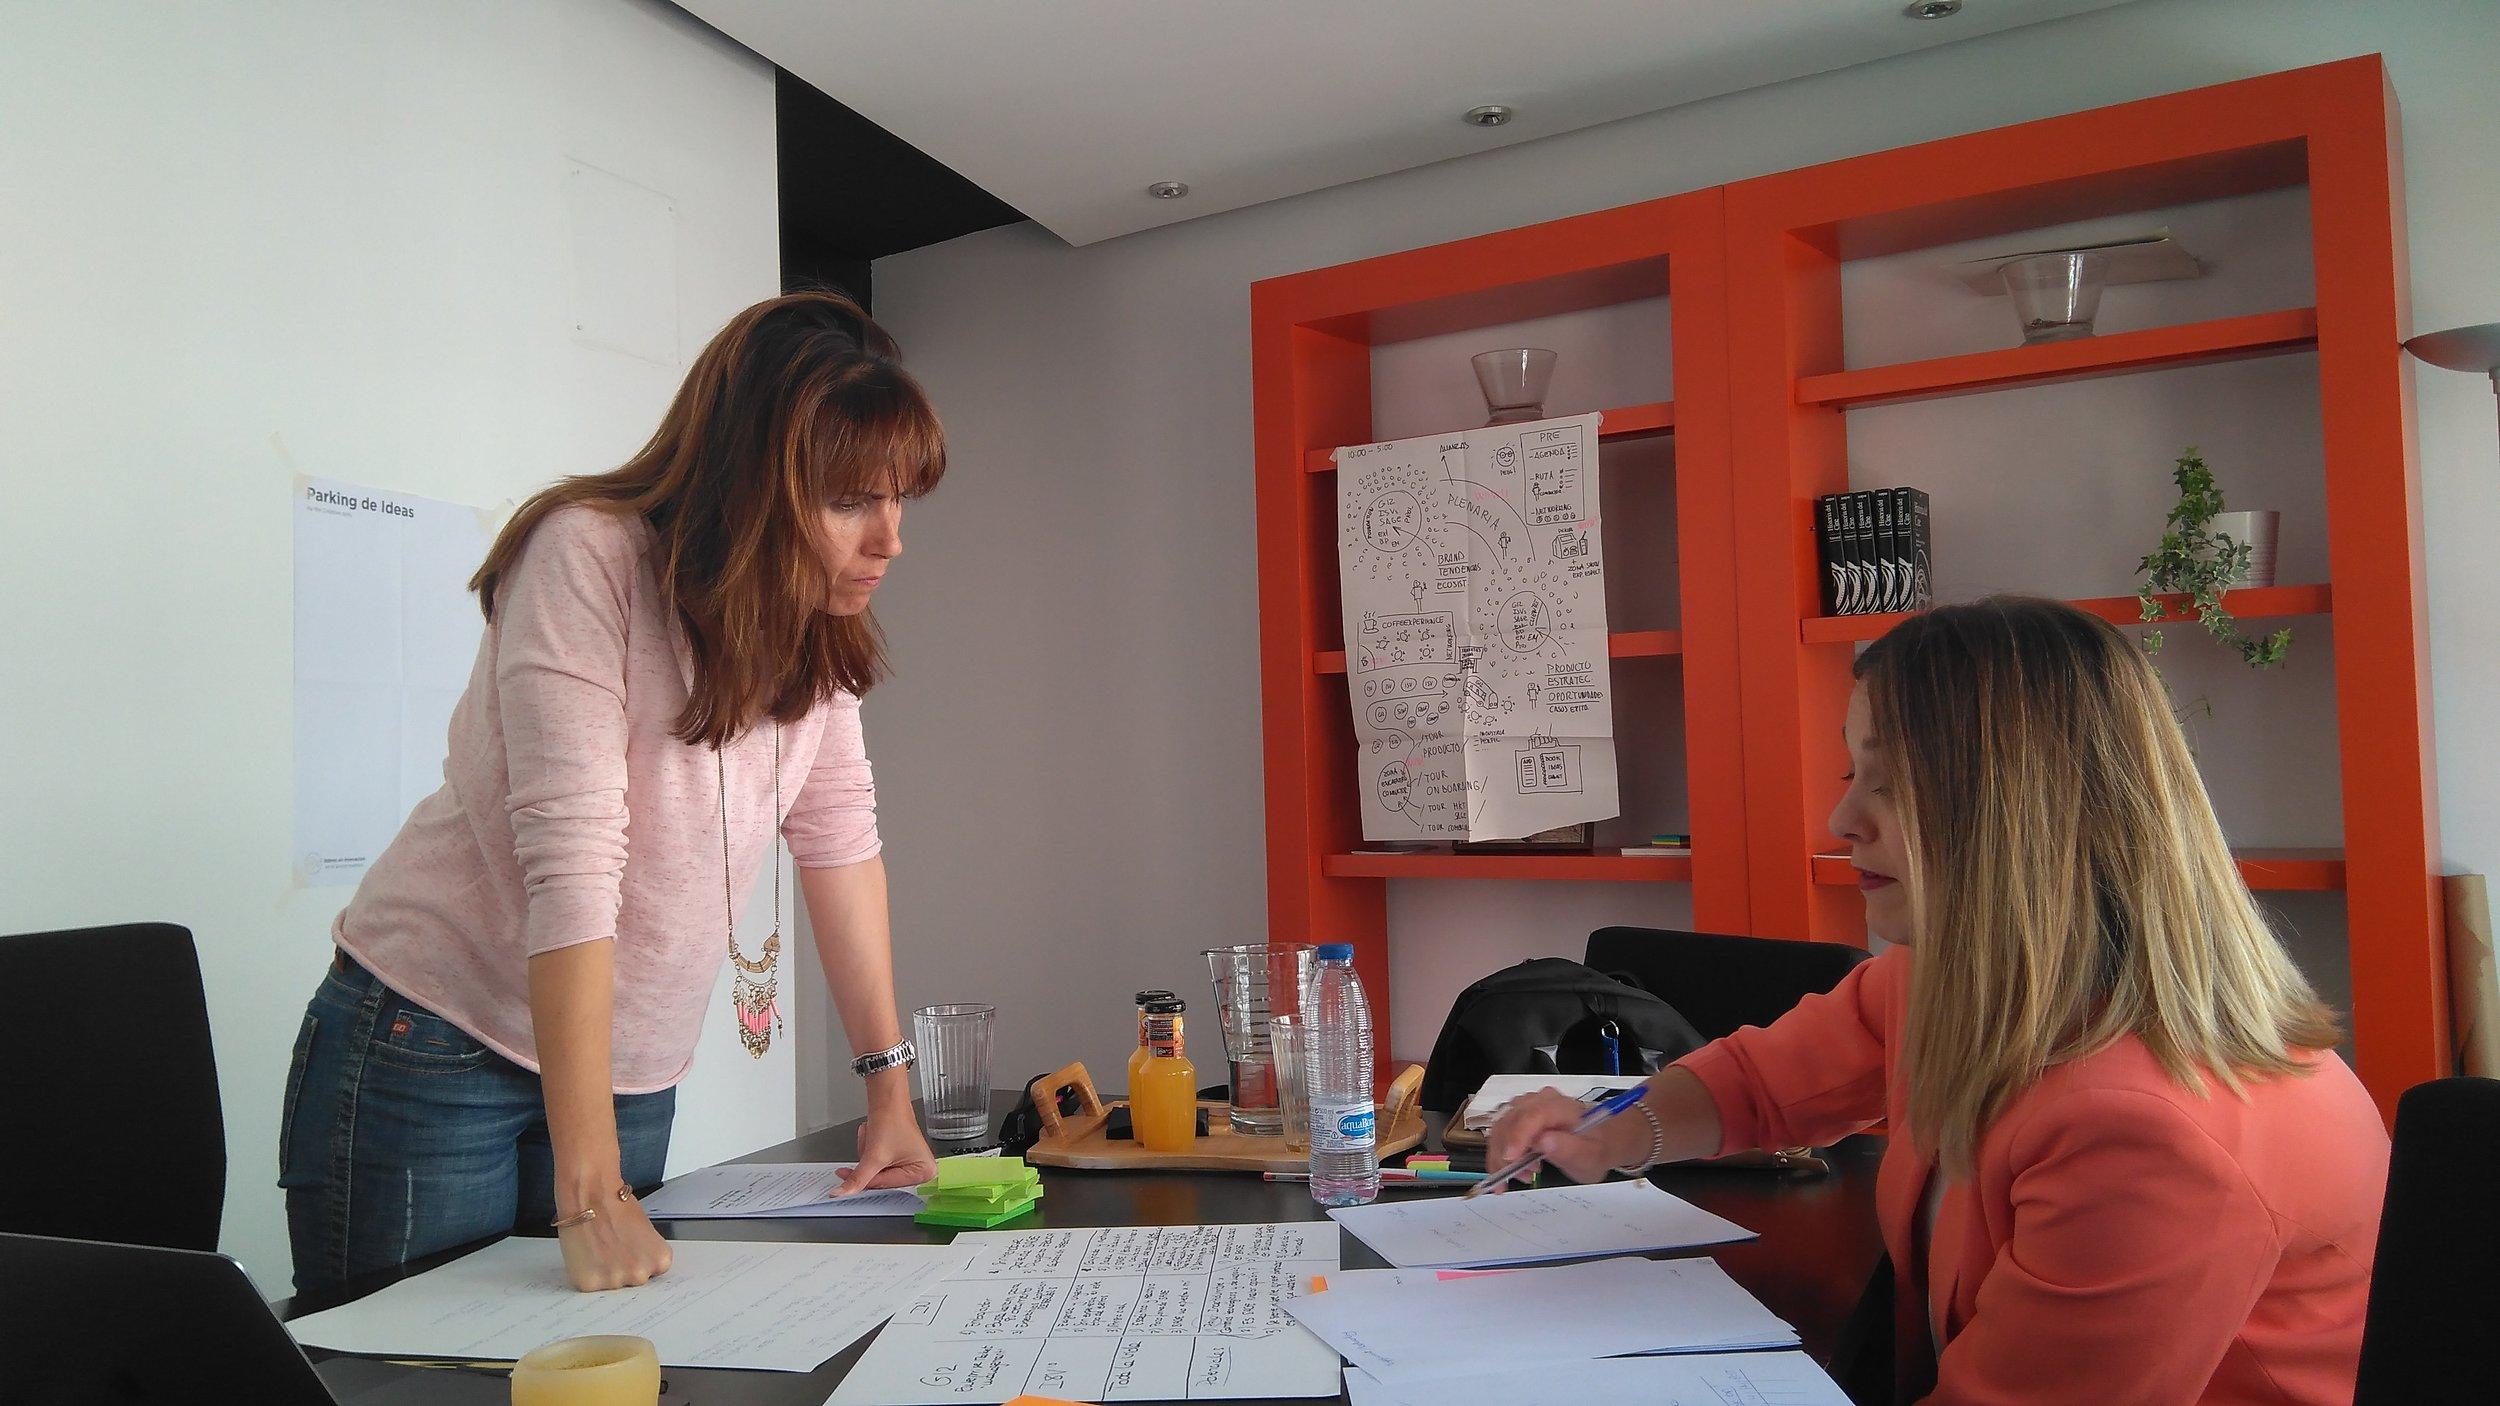 Ángeles Moreno & Pilar Jiménez | Prototyping session